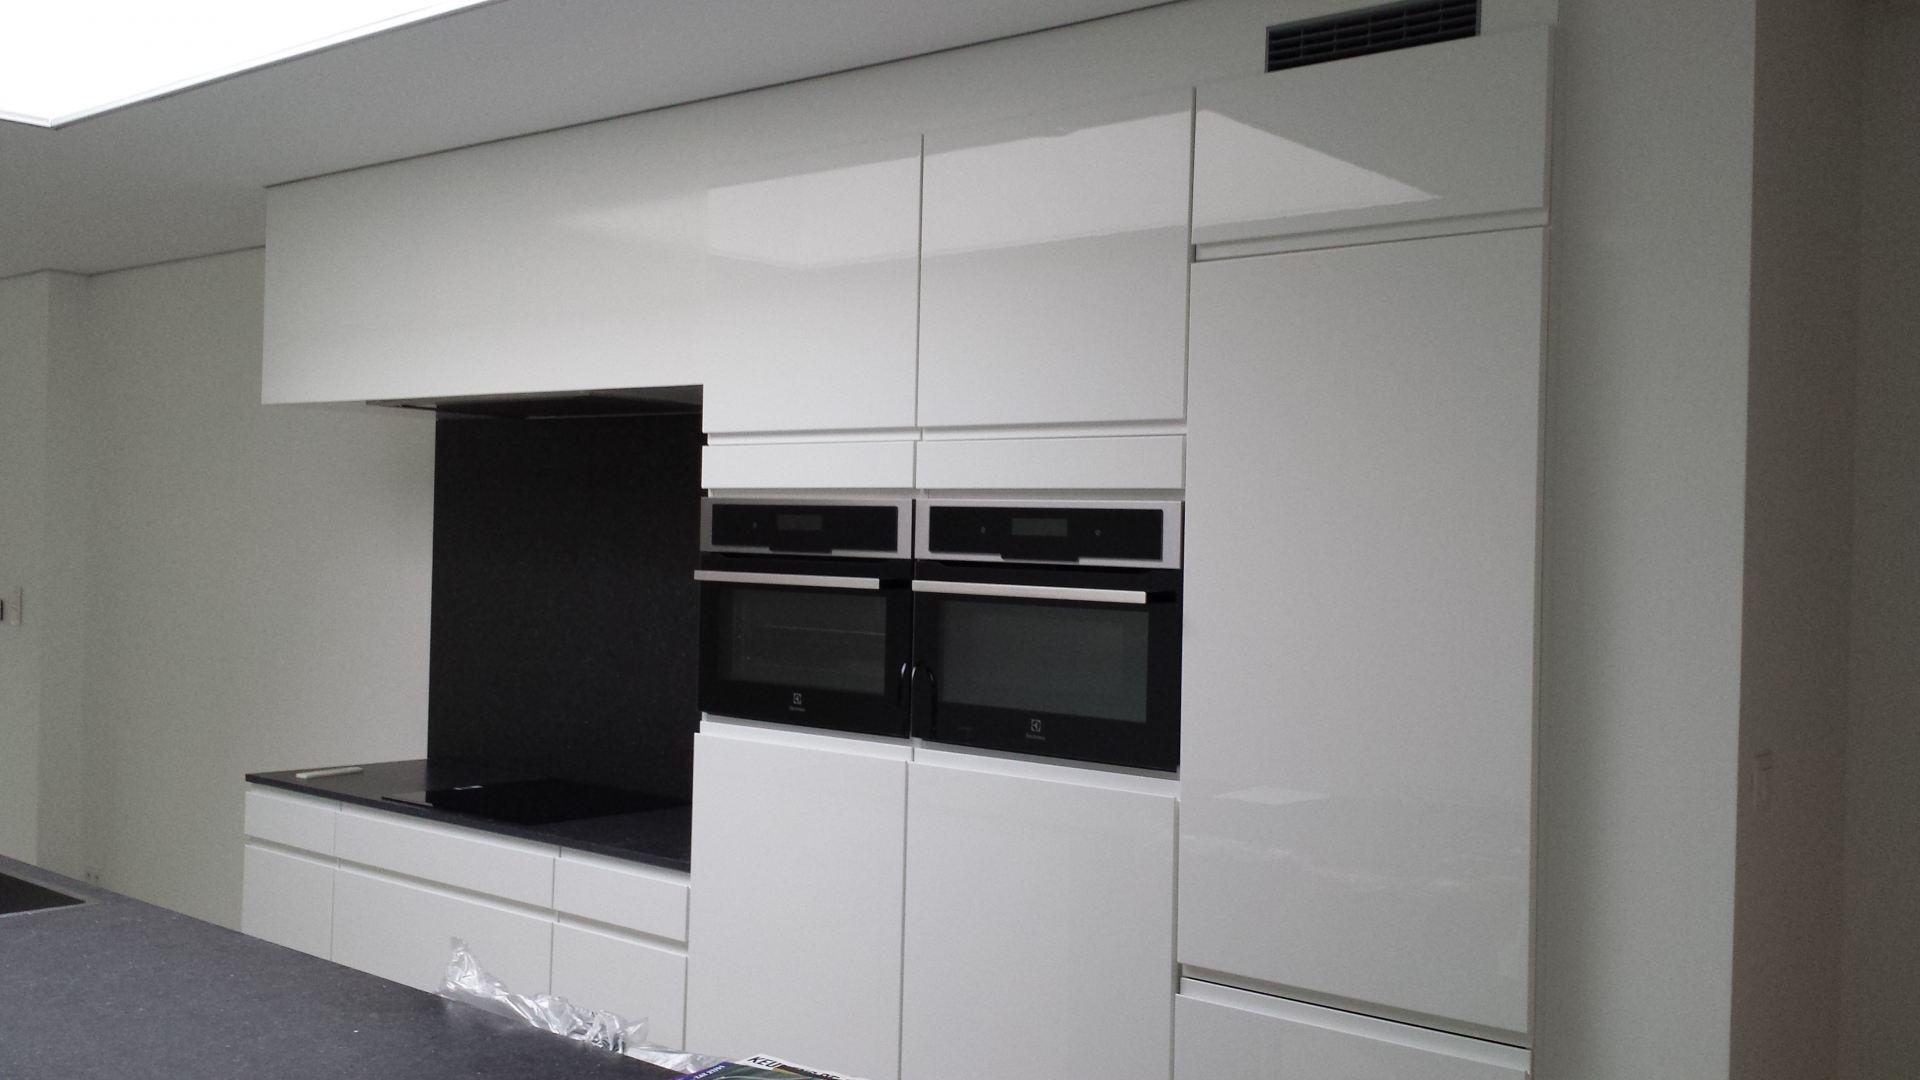 Keuken renovatie te sint niklaas. de klussenier frankie coppens